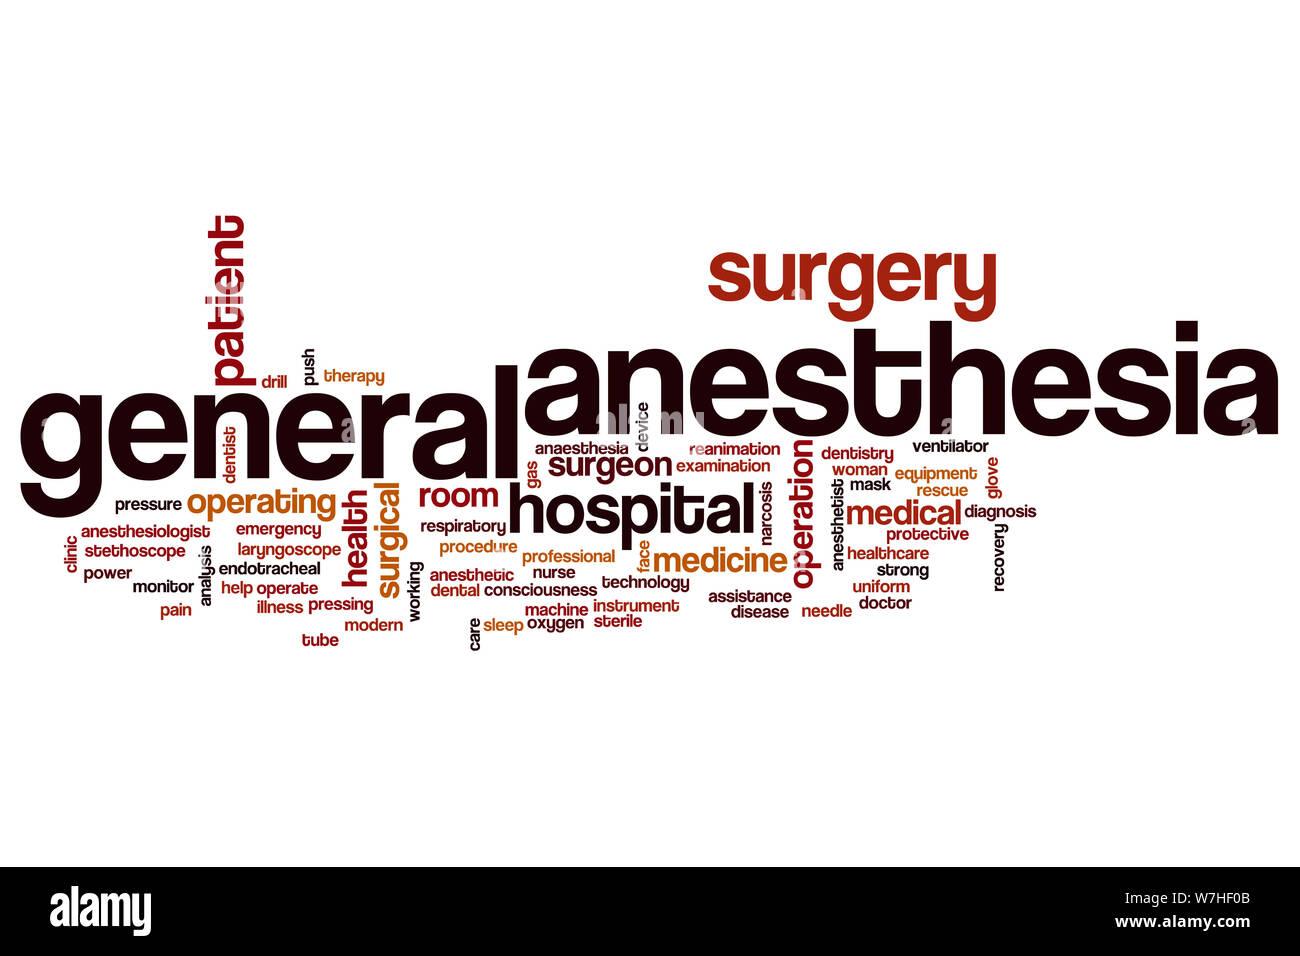 General Anesthesia Stock Photos & General Anesthesia Stock